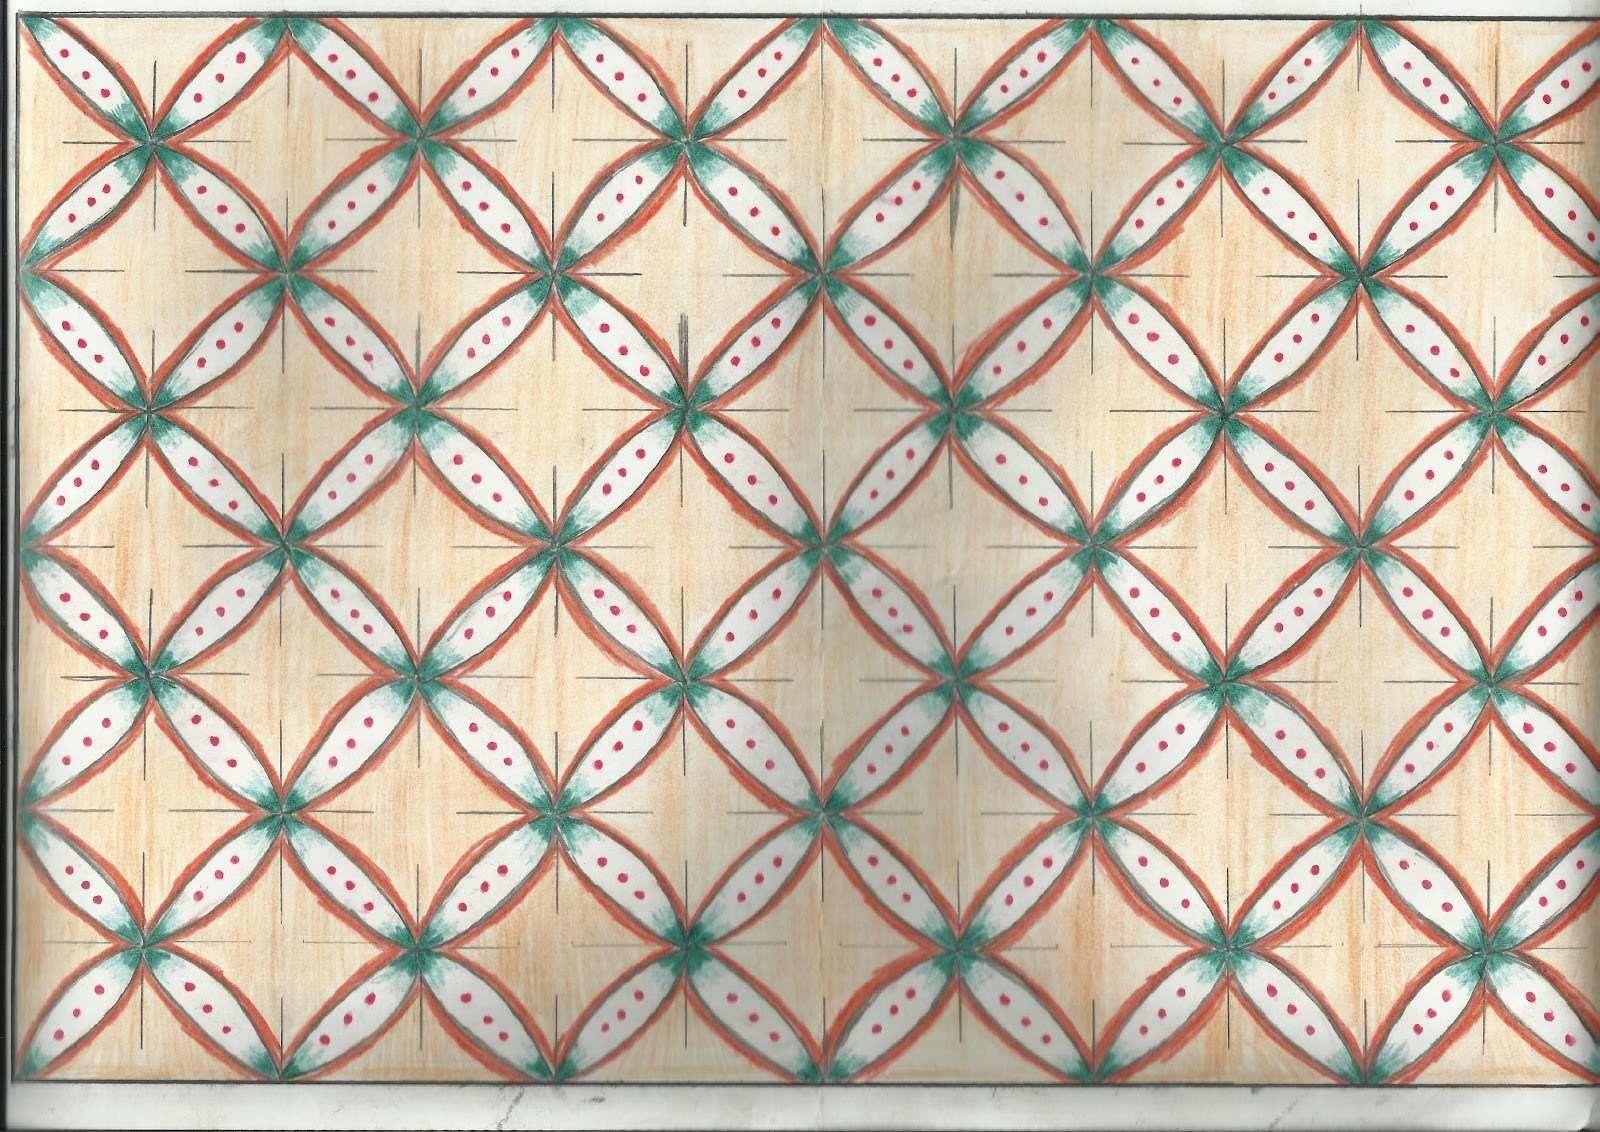 Motif Batik Bunga Dibuku Gambar Contoh Motif Batik Yang Mudah Di   Gambar, Sketsa, Menggambar sketsa